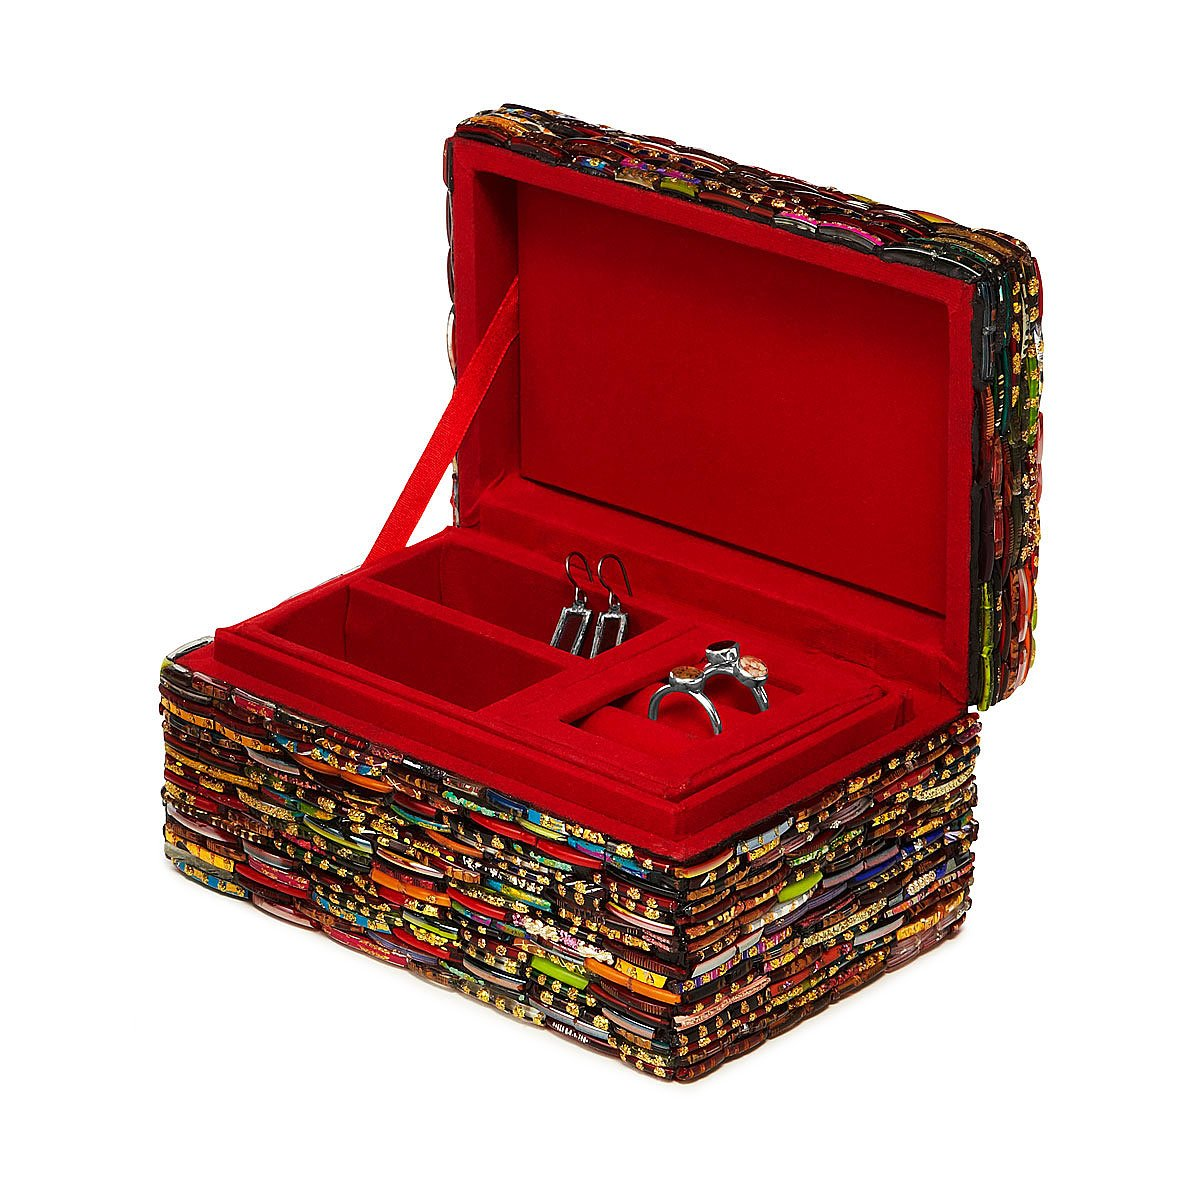 Bangle Jewelry Box handmade Indian jewelry box unique creative